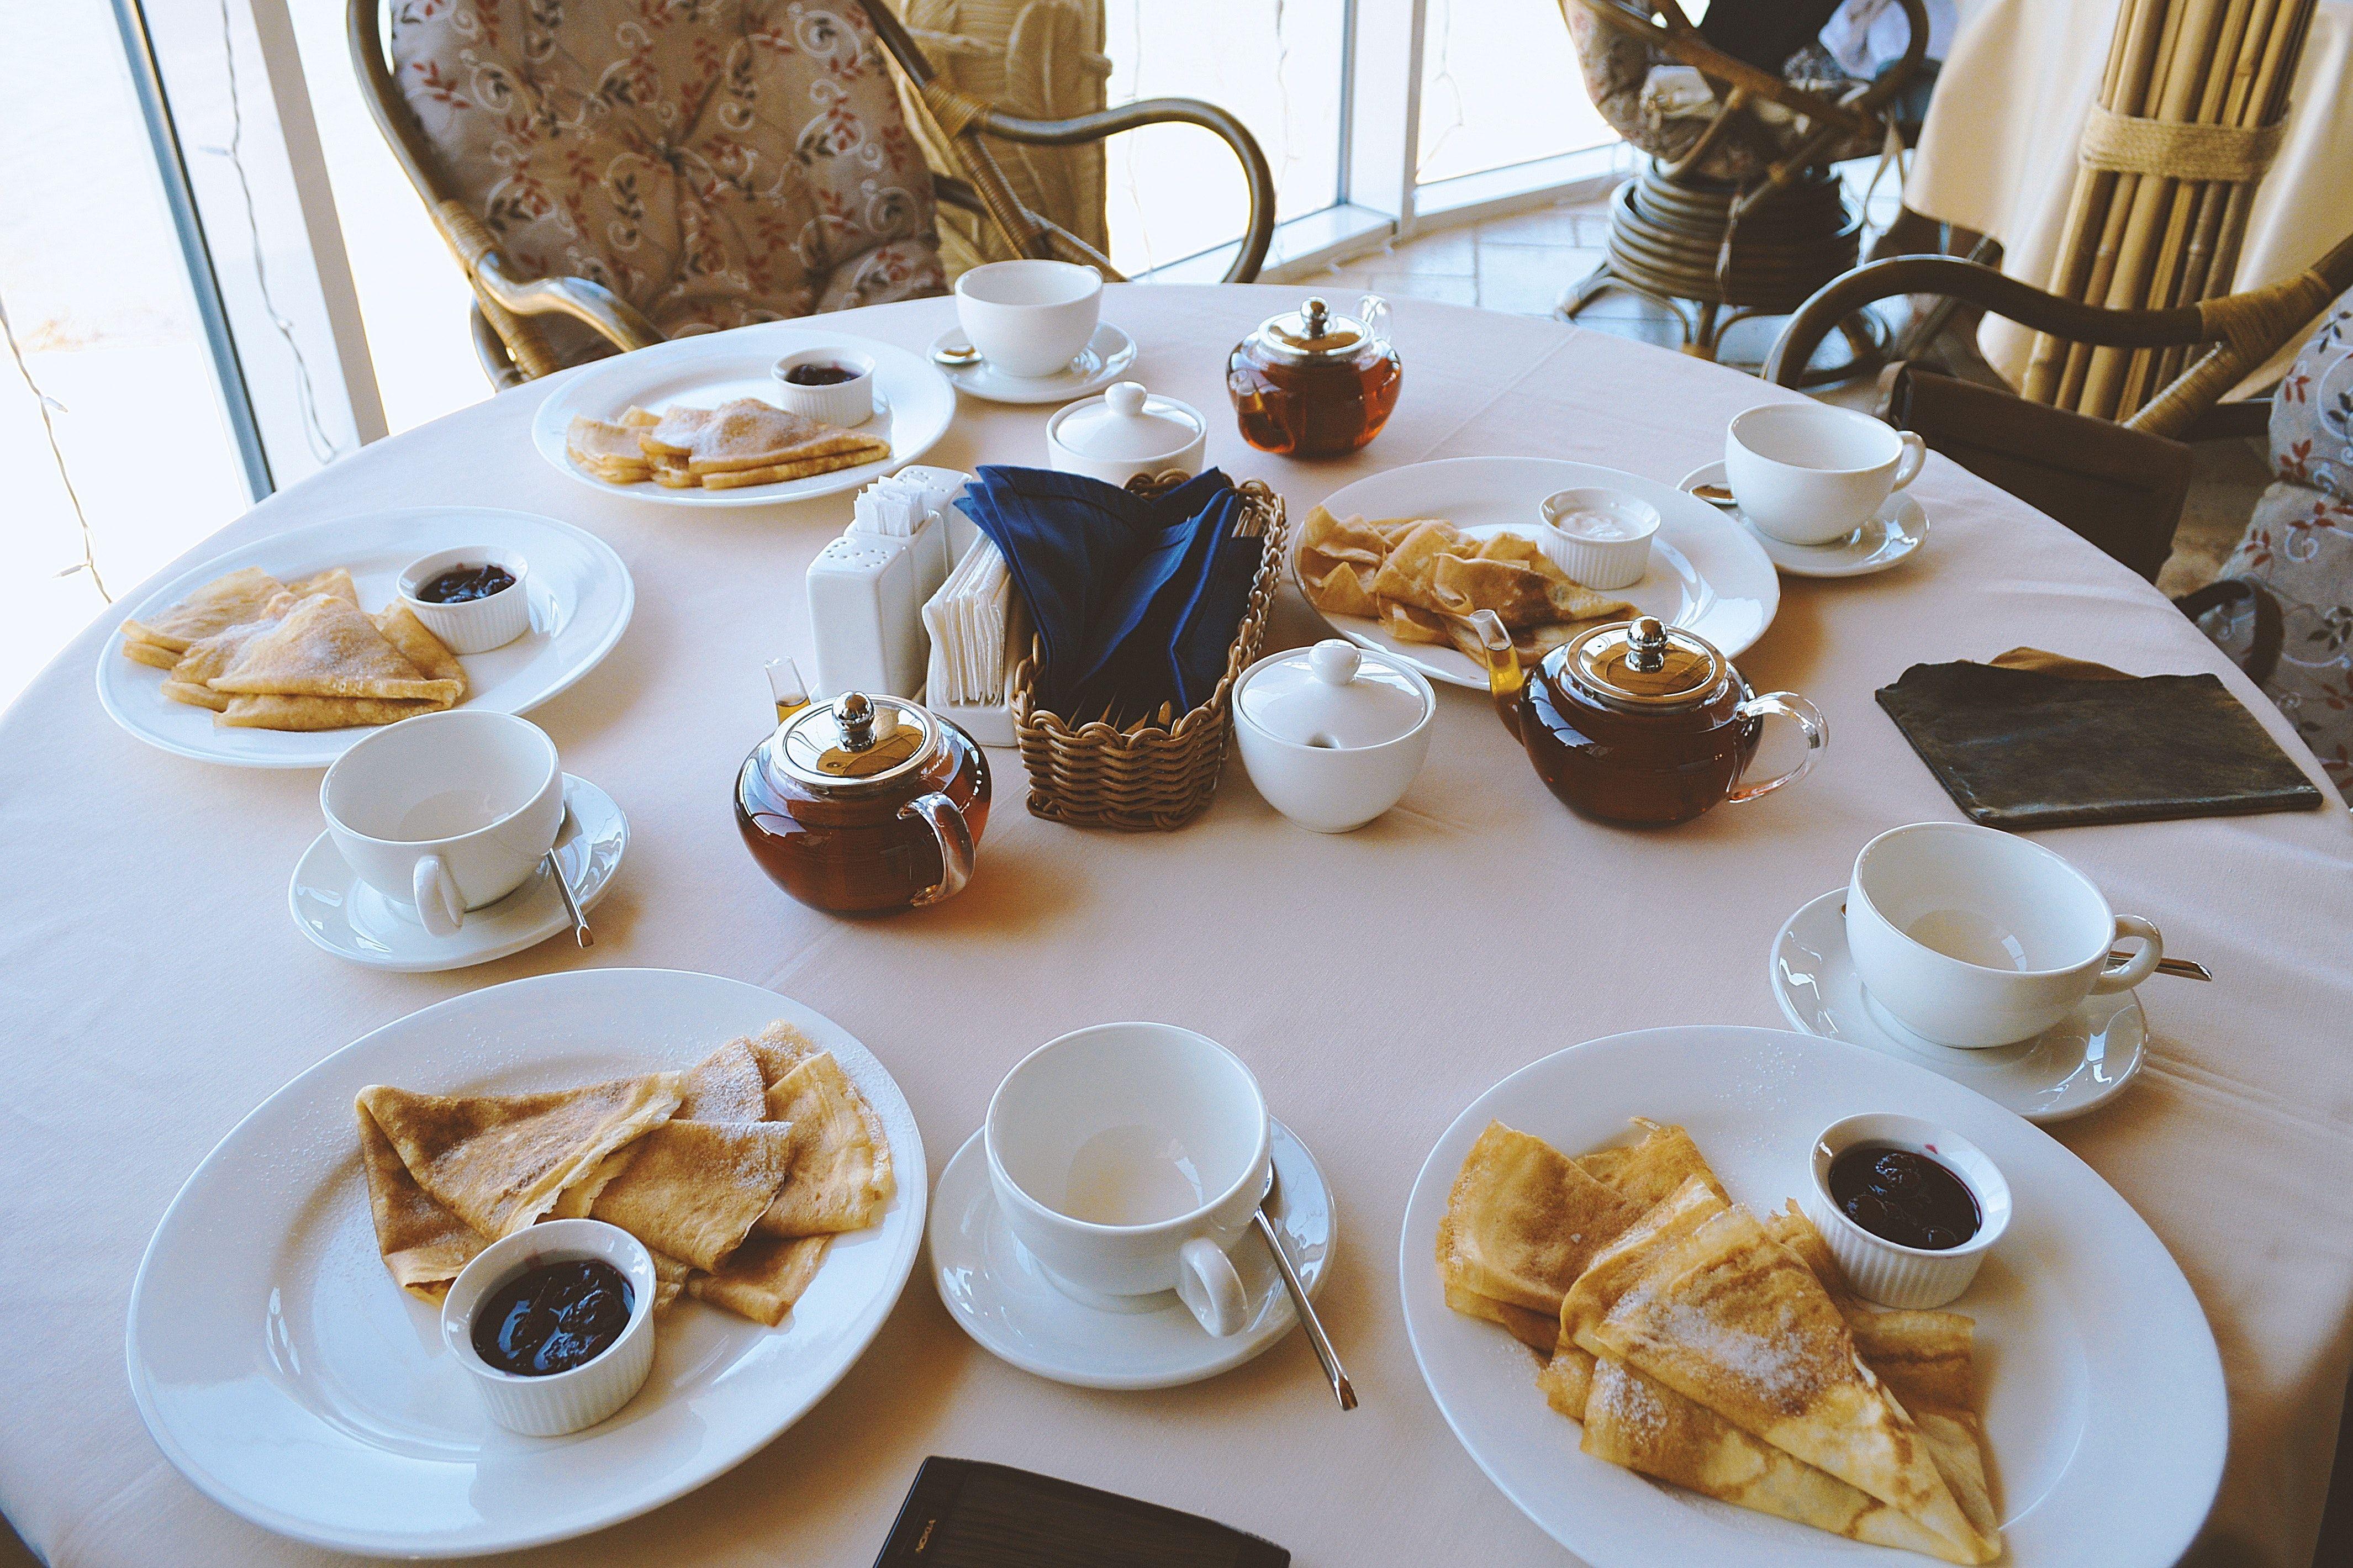 White Ceramic Dinnerware on Table, breakfast chairs